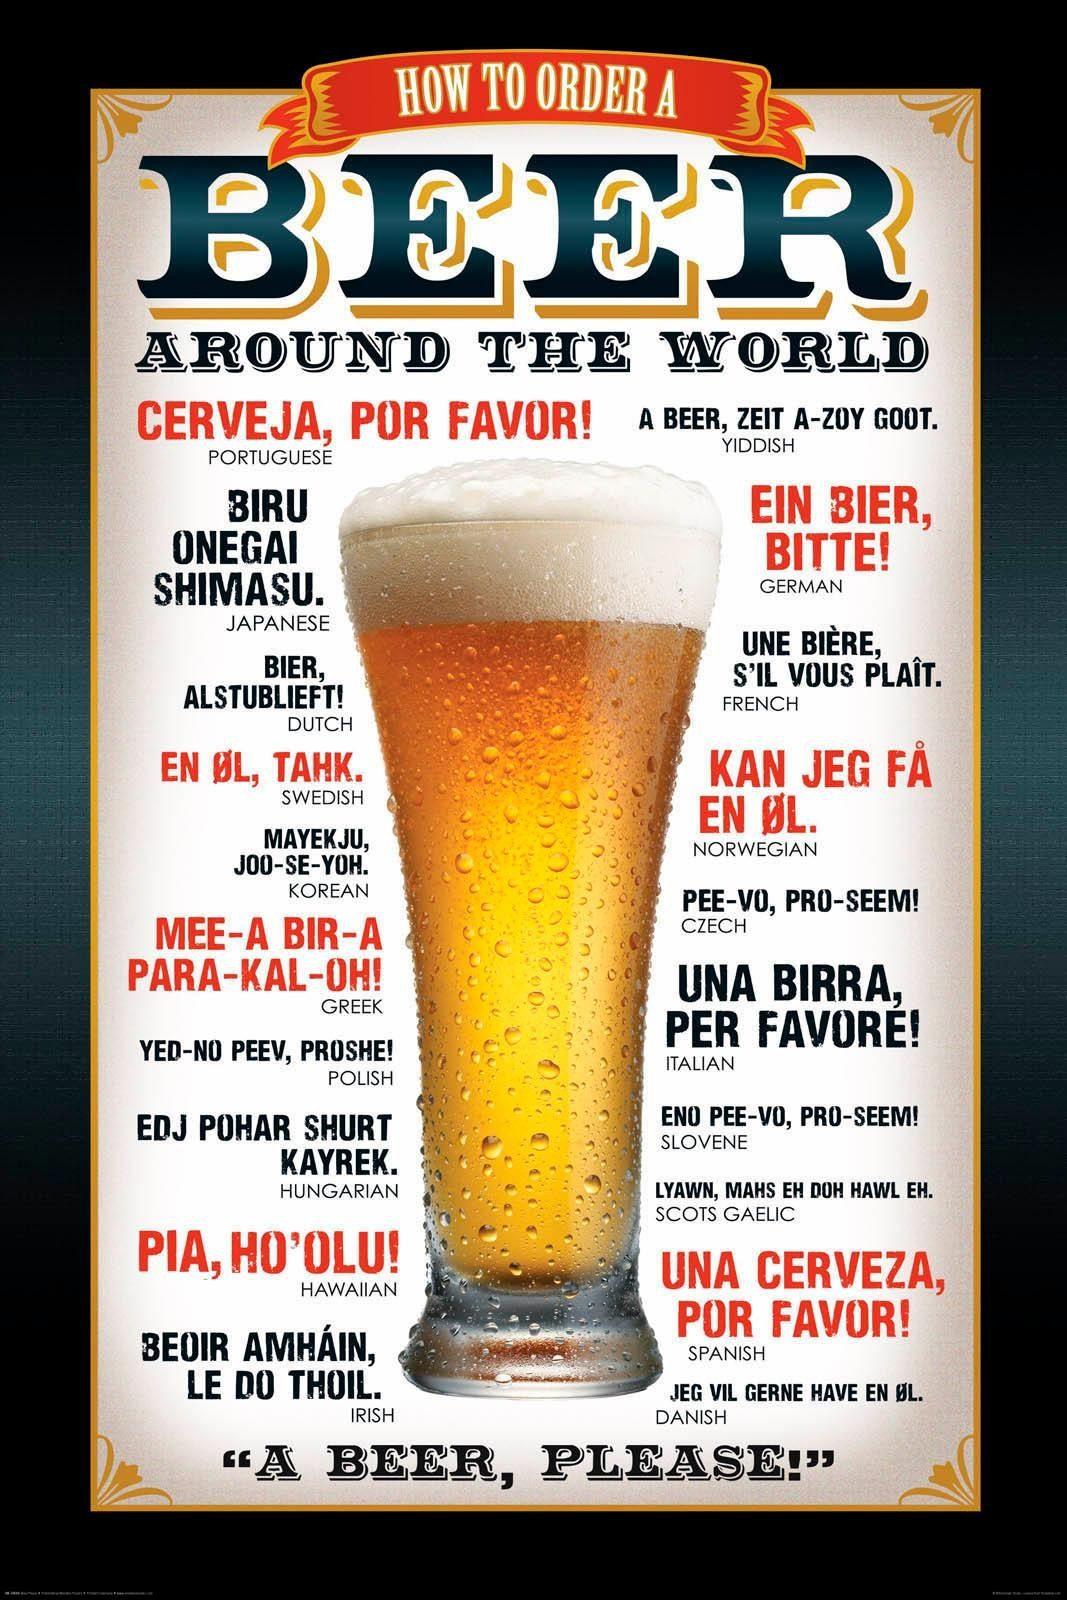 Deco-Panel »Bier bitte!«, Getränk, Schriftzüge, 60/90 cm